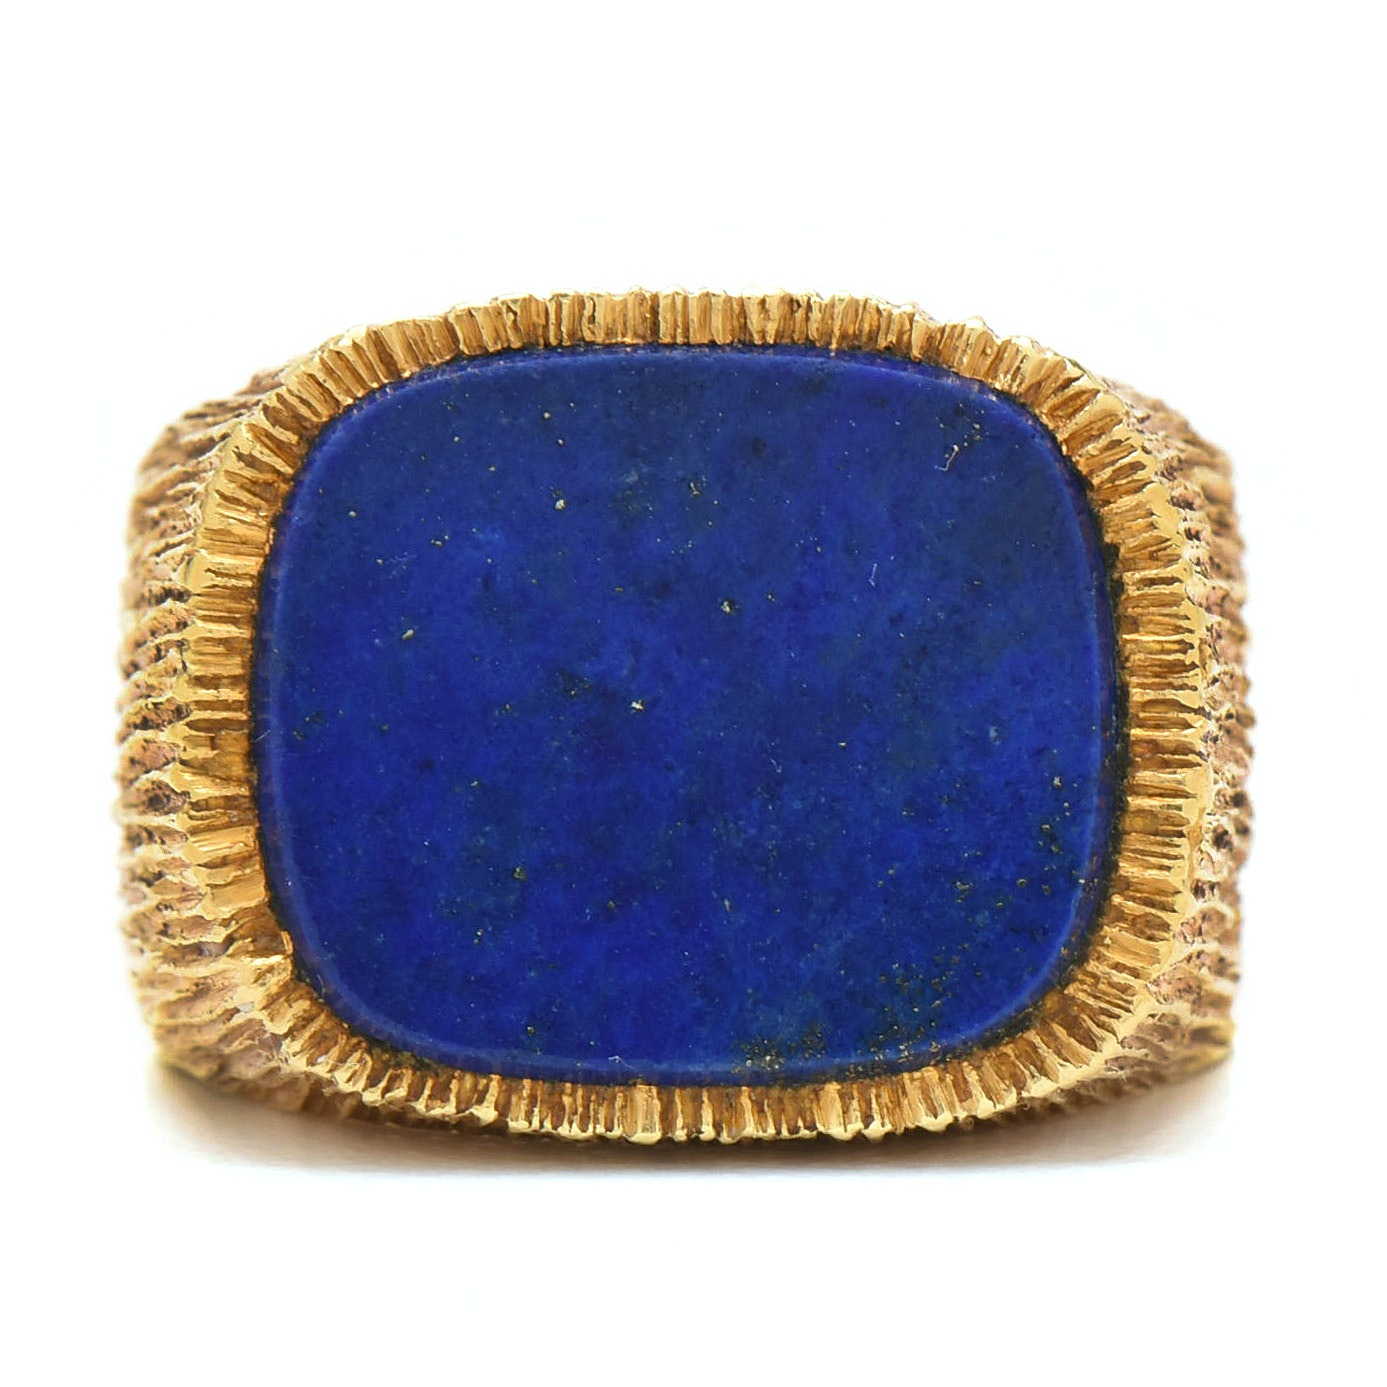 18K Yellow Gold Lapis Lazuli Brutalist Signet Ring